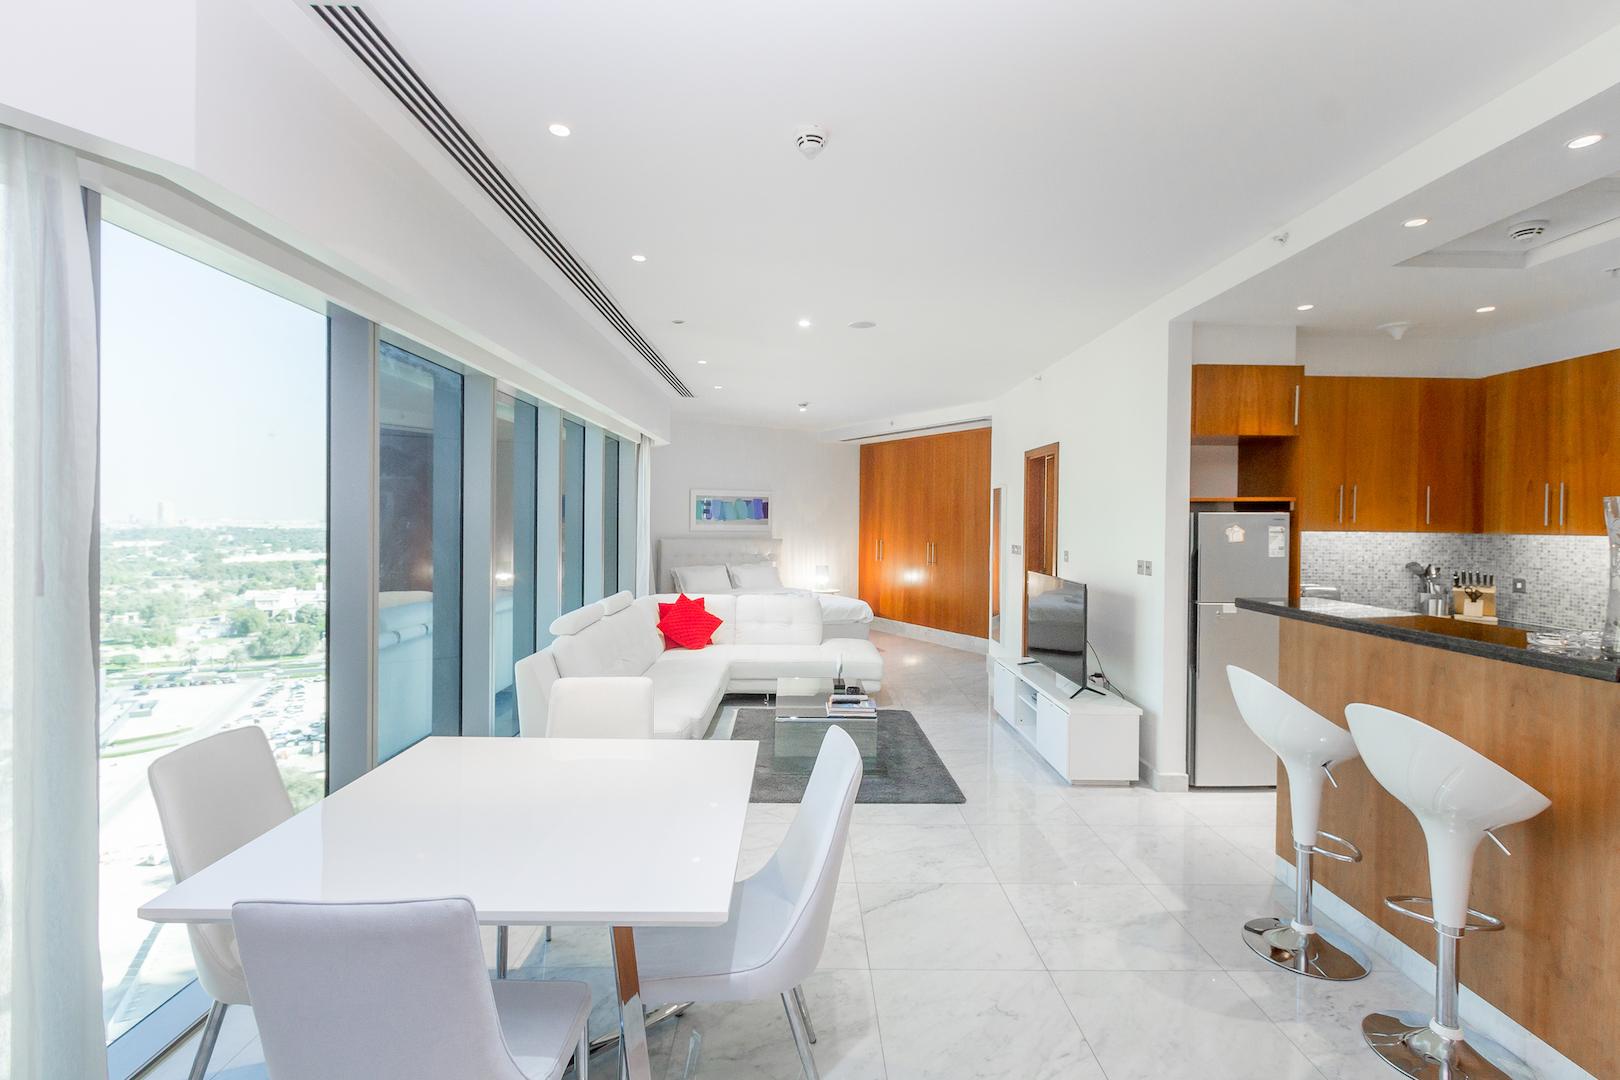 Dubai, Emirats arabes unis Appartement #RU1393019